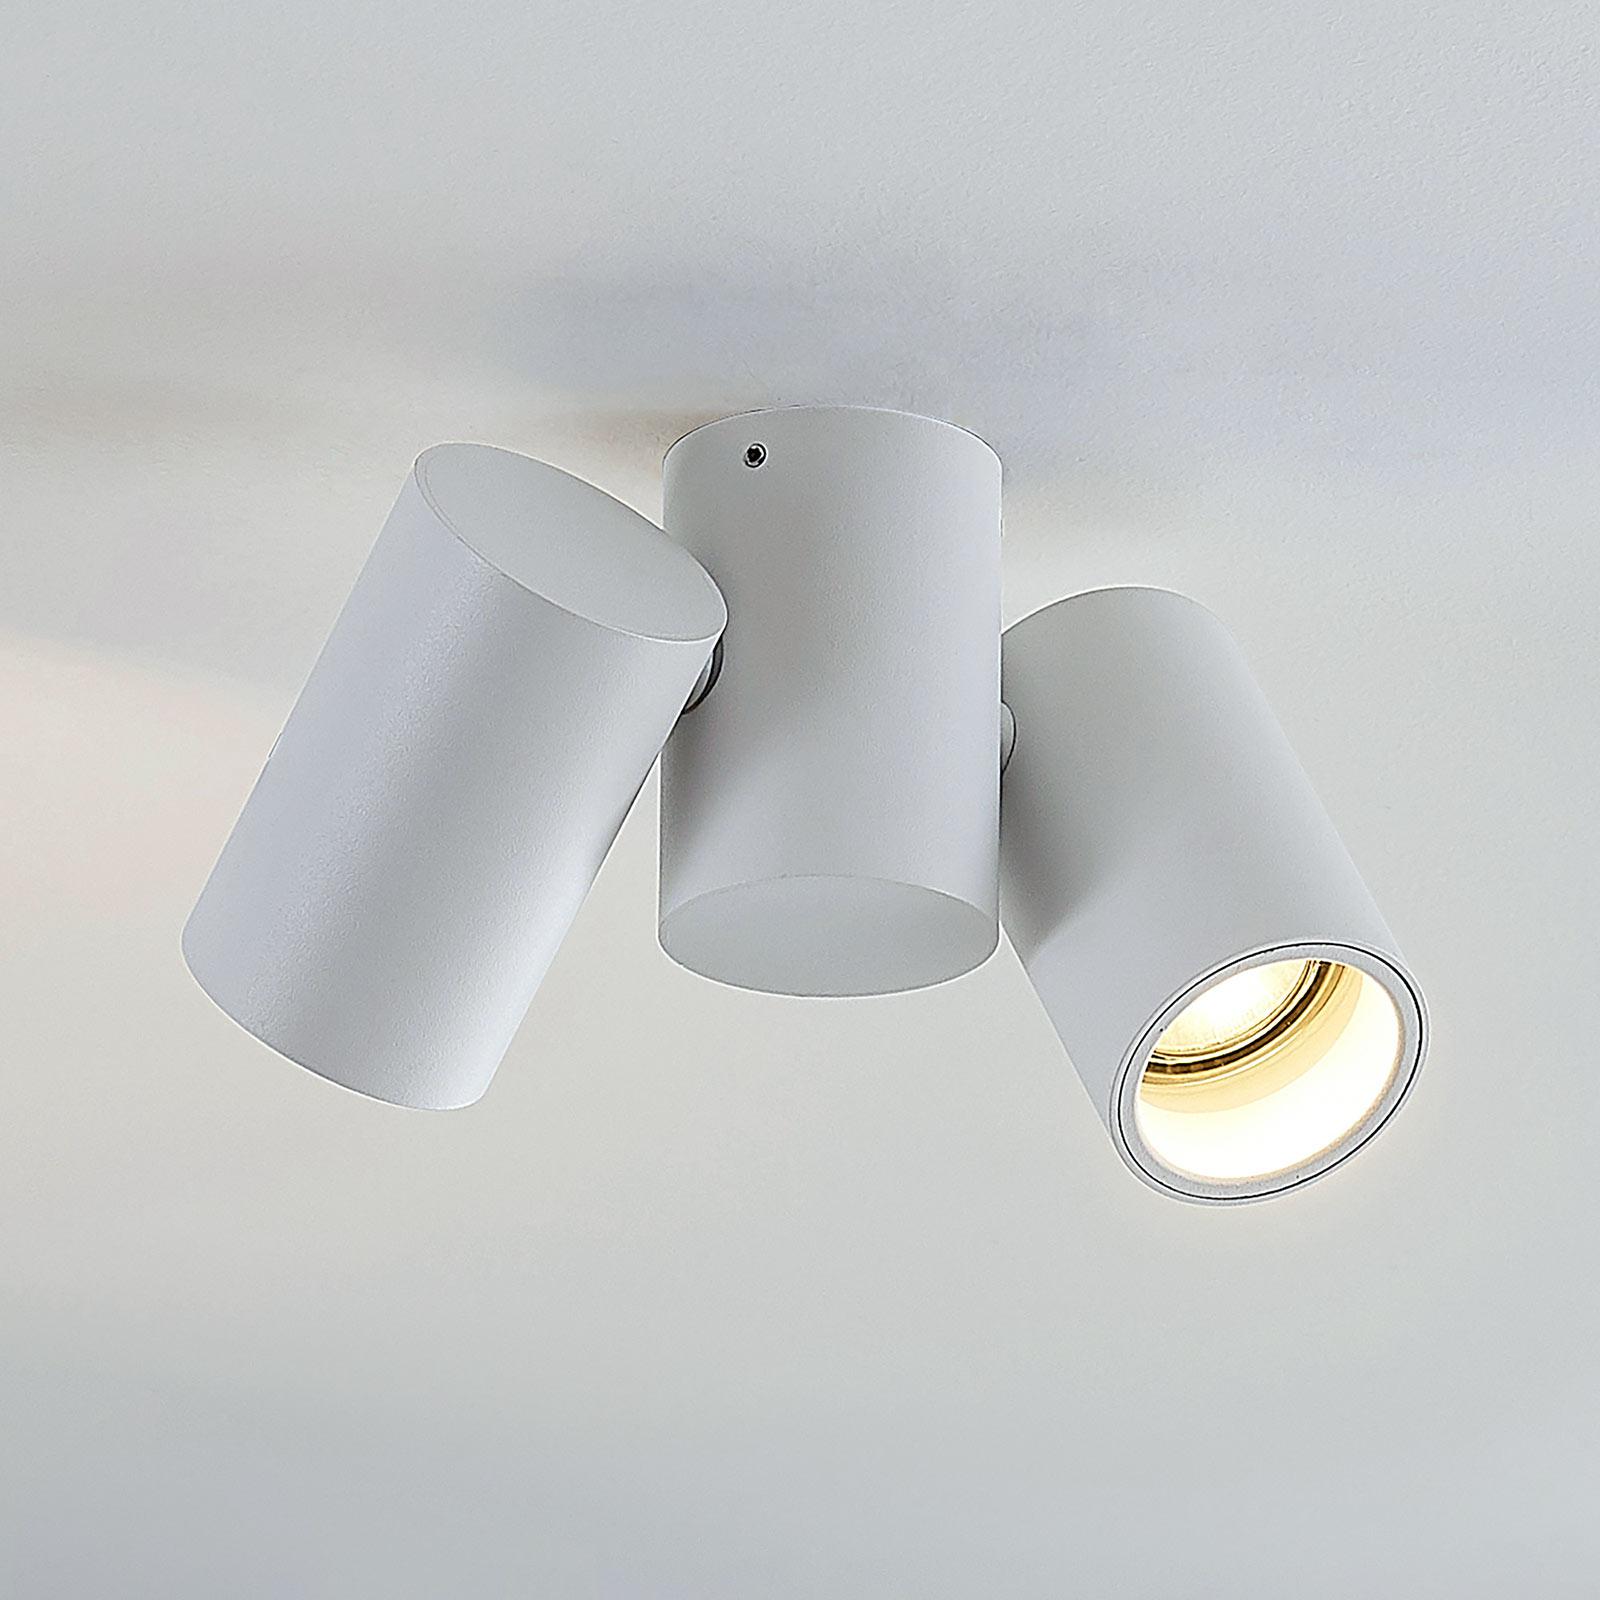 Taklampe Gesina, 2 lyskilder, hvit